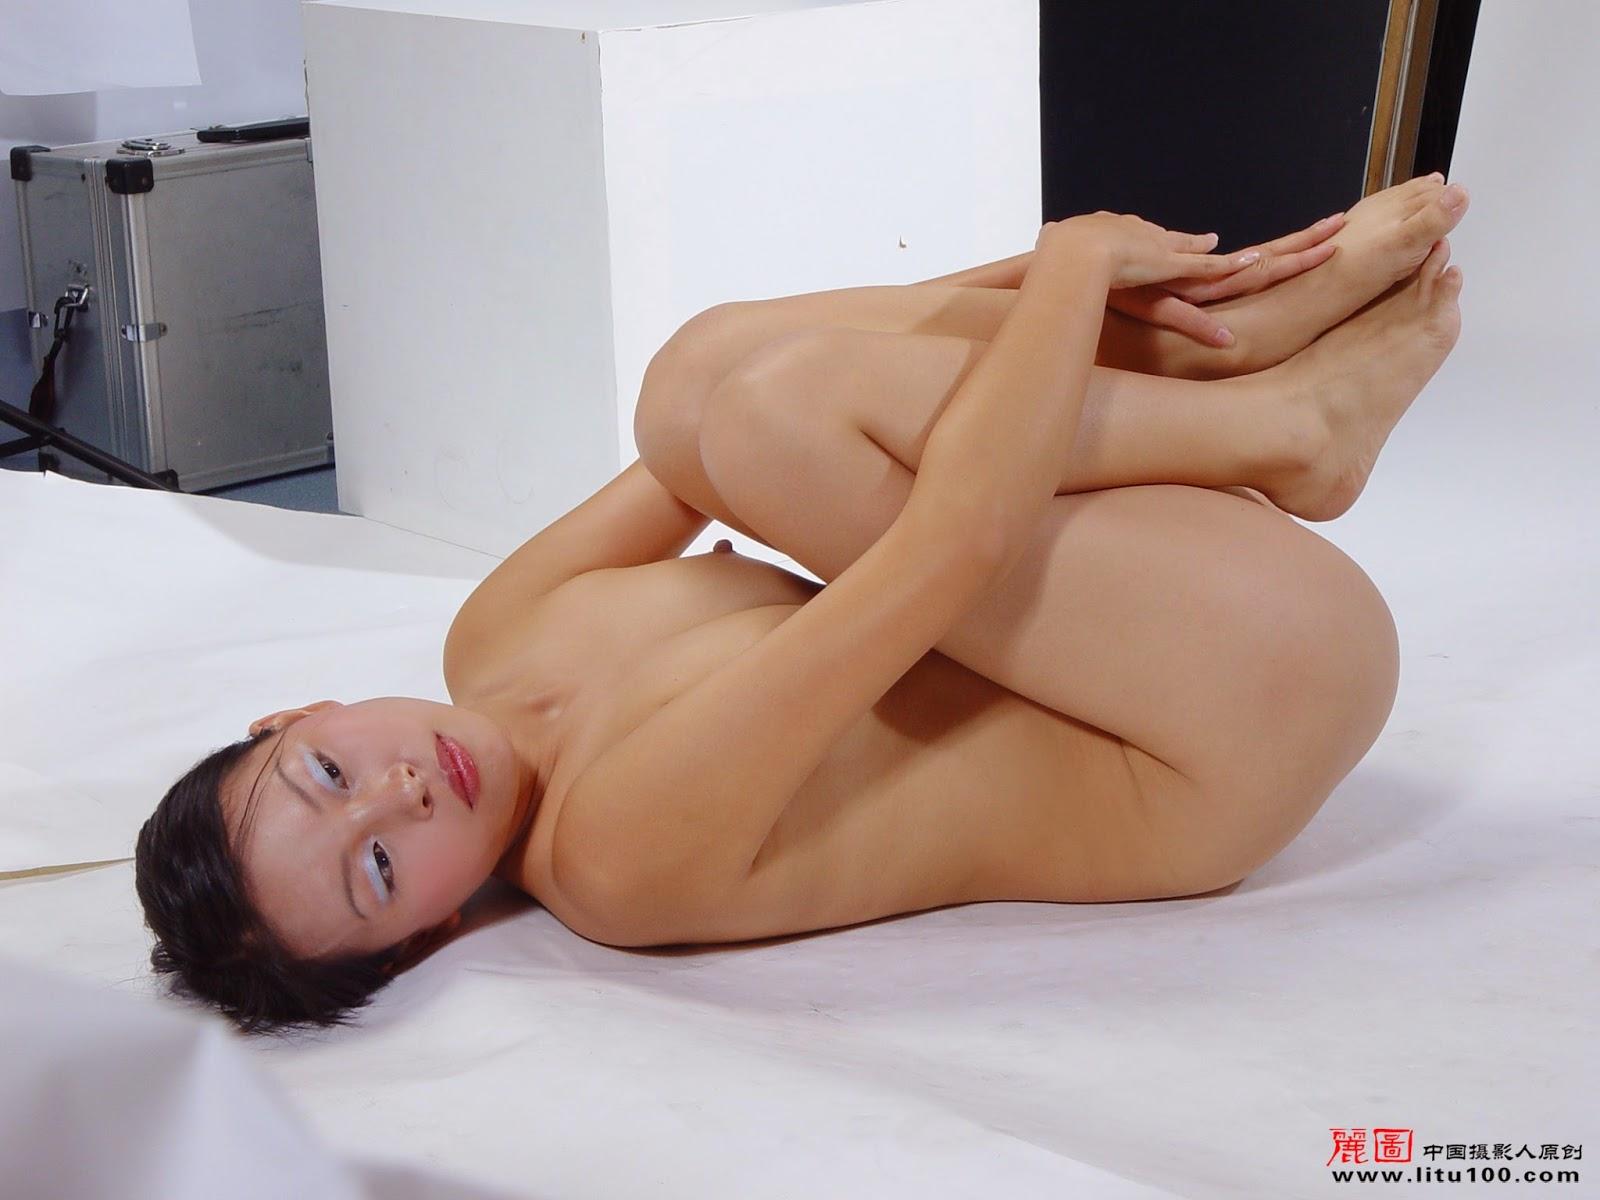 Live sex chat cam